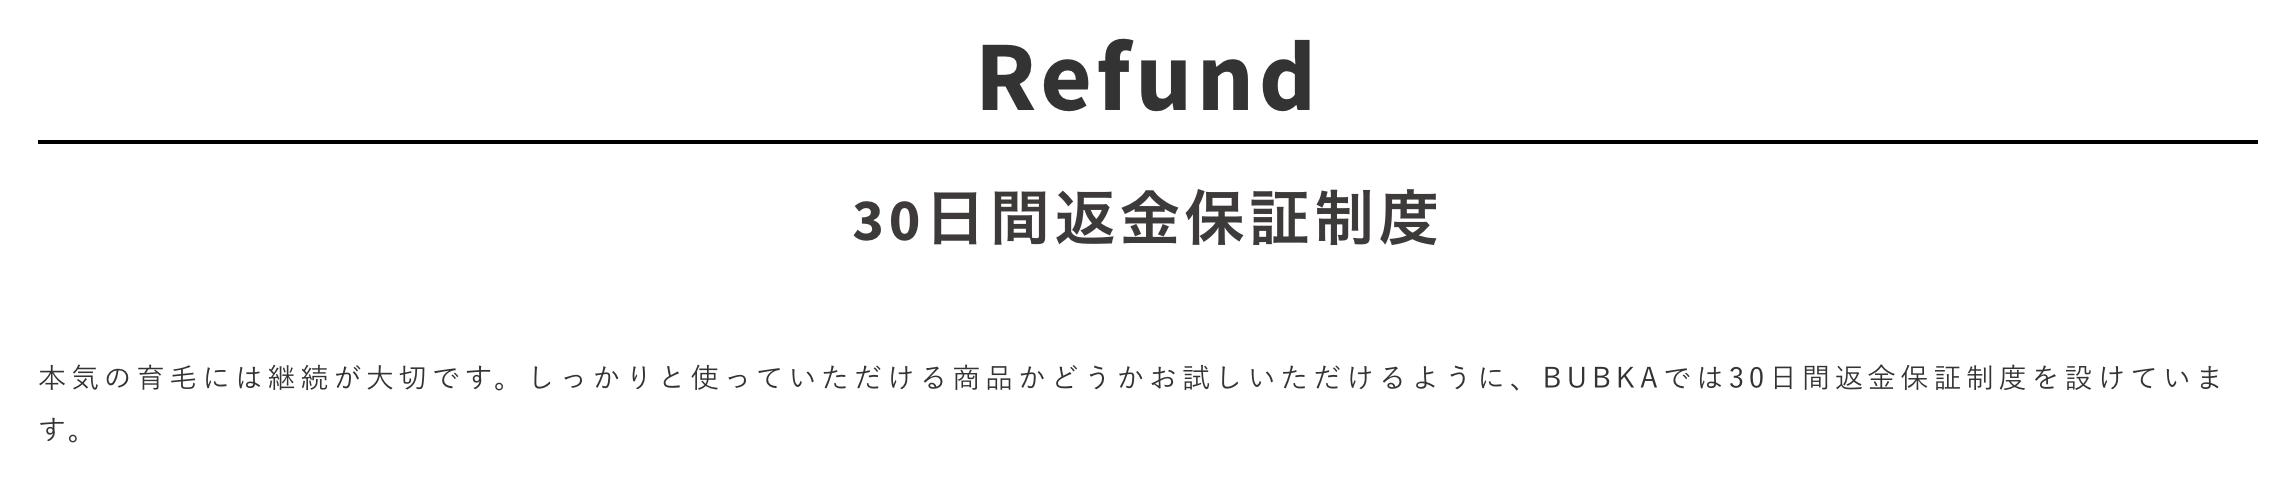 BUBKA ZEROの返金保証制度